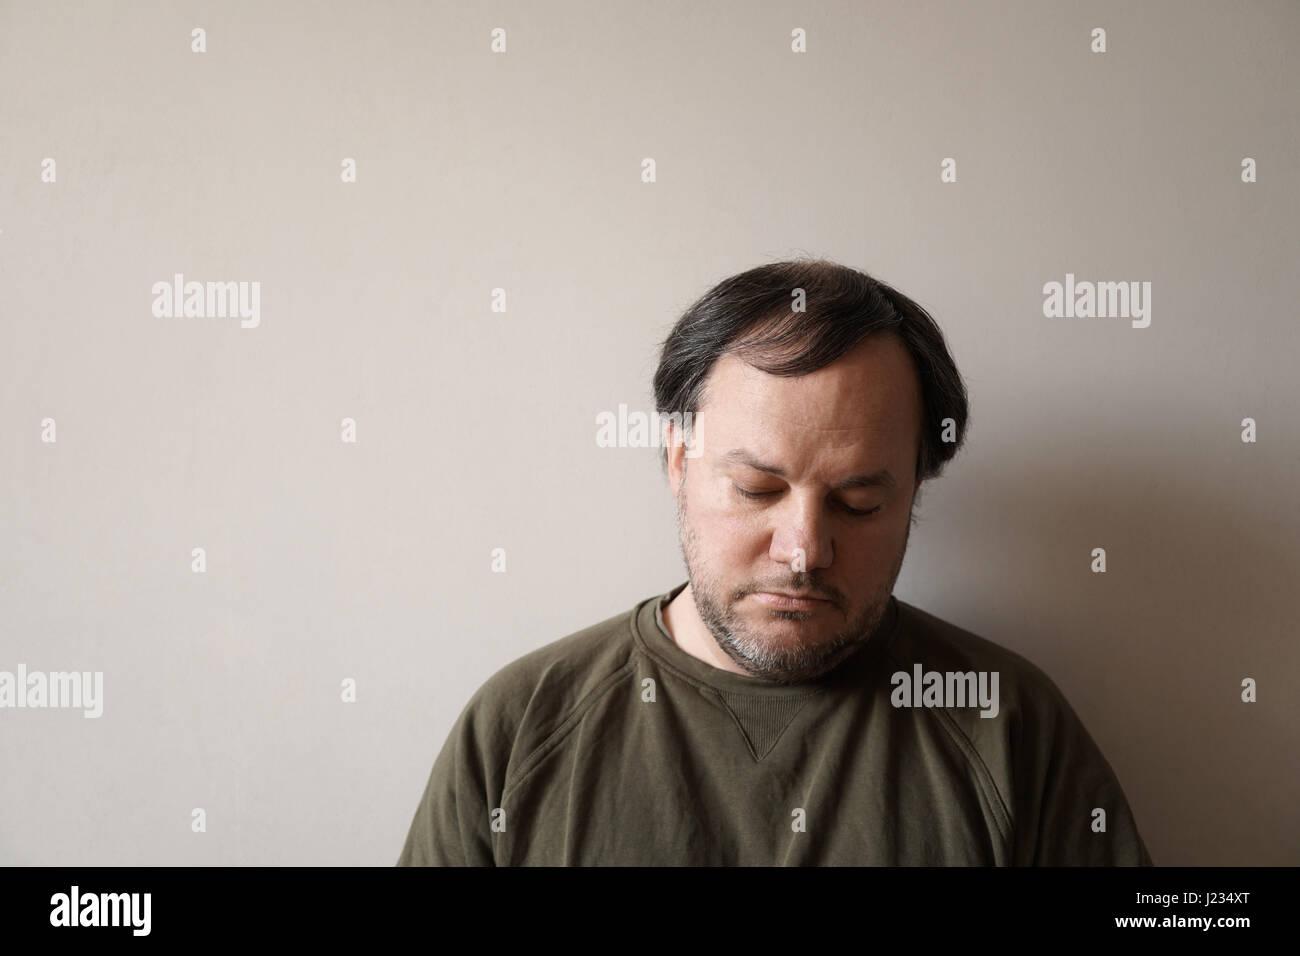 depressed man in his forties - Stock Image